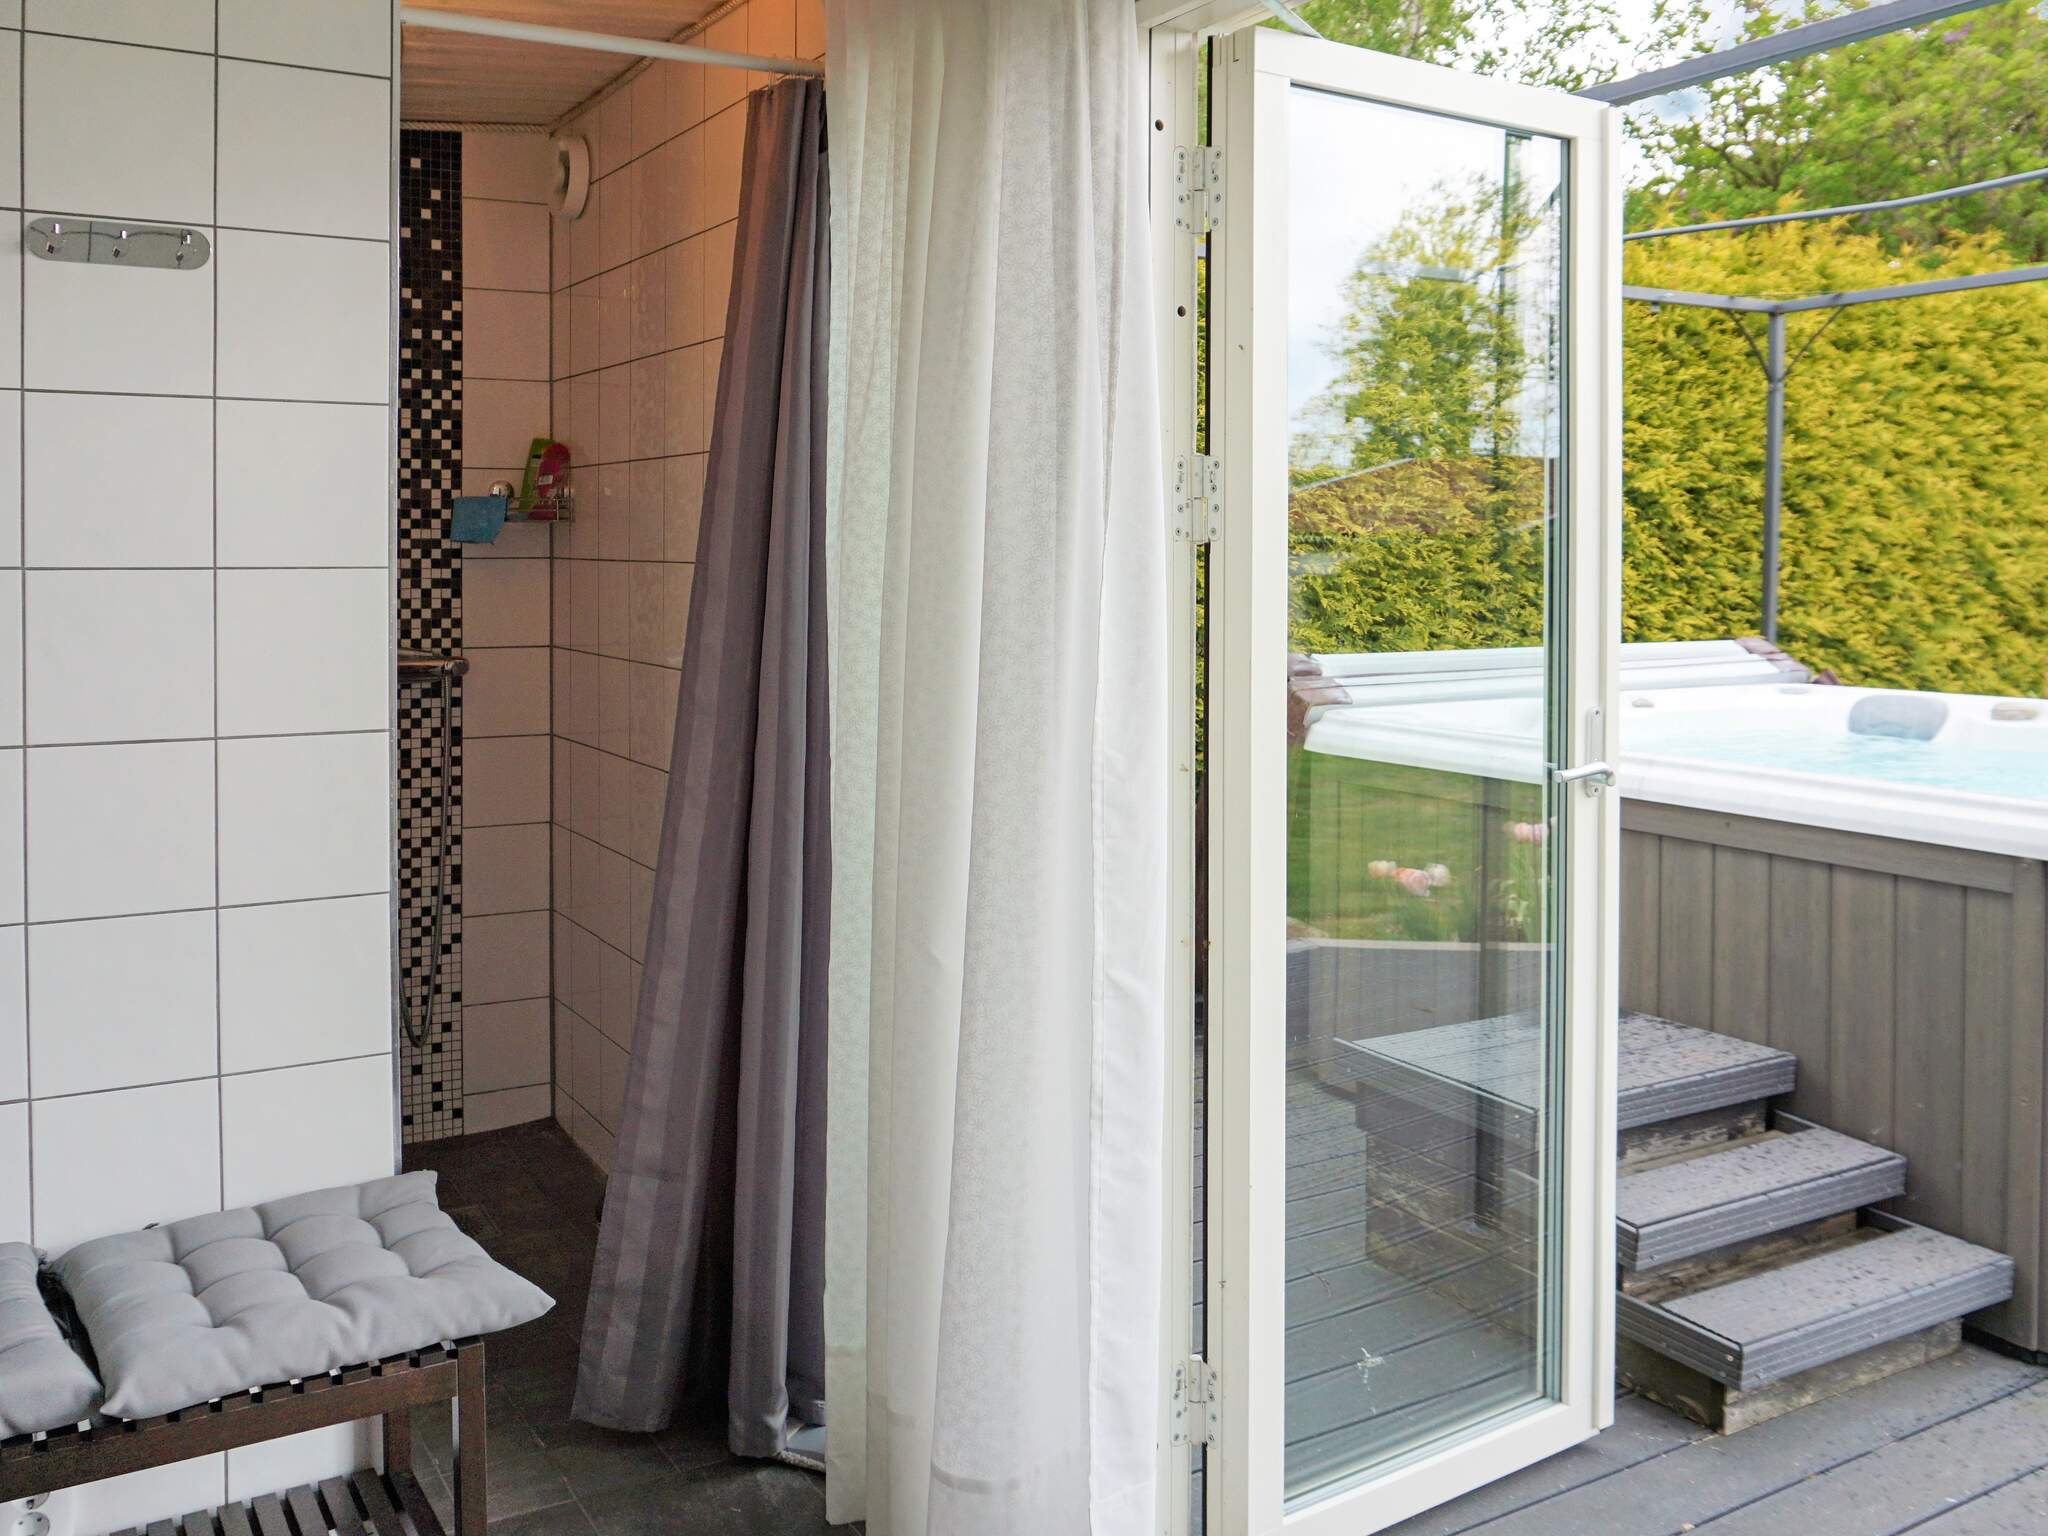 Ferienhaus Onsala (2619121), Onsala, Hallands län, Südschweden, Schweden, Bild 3